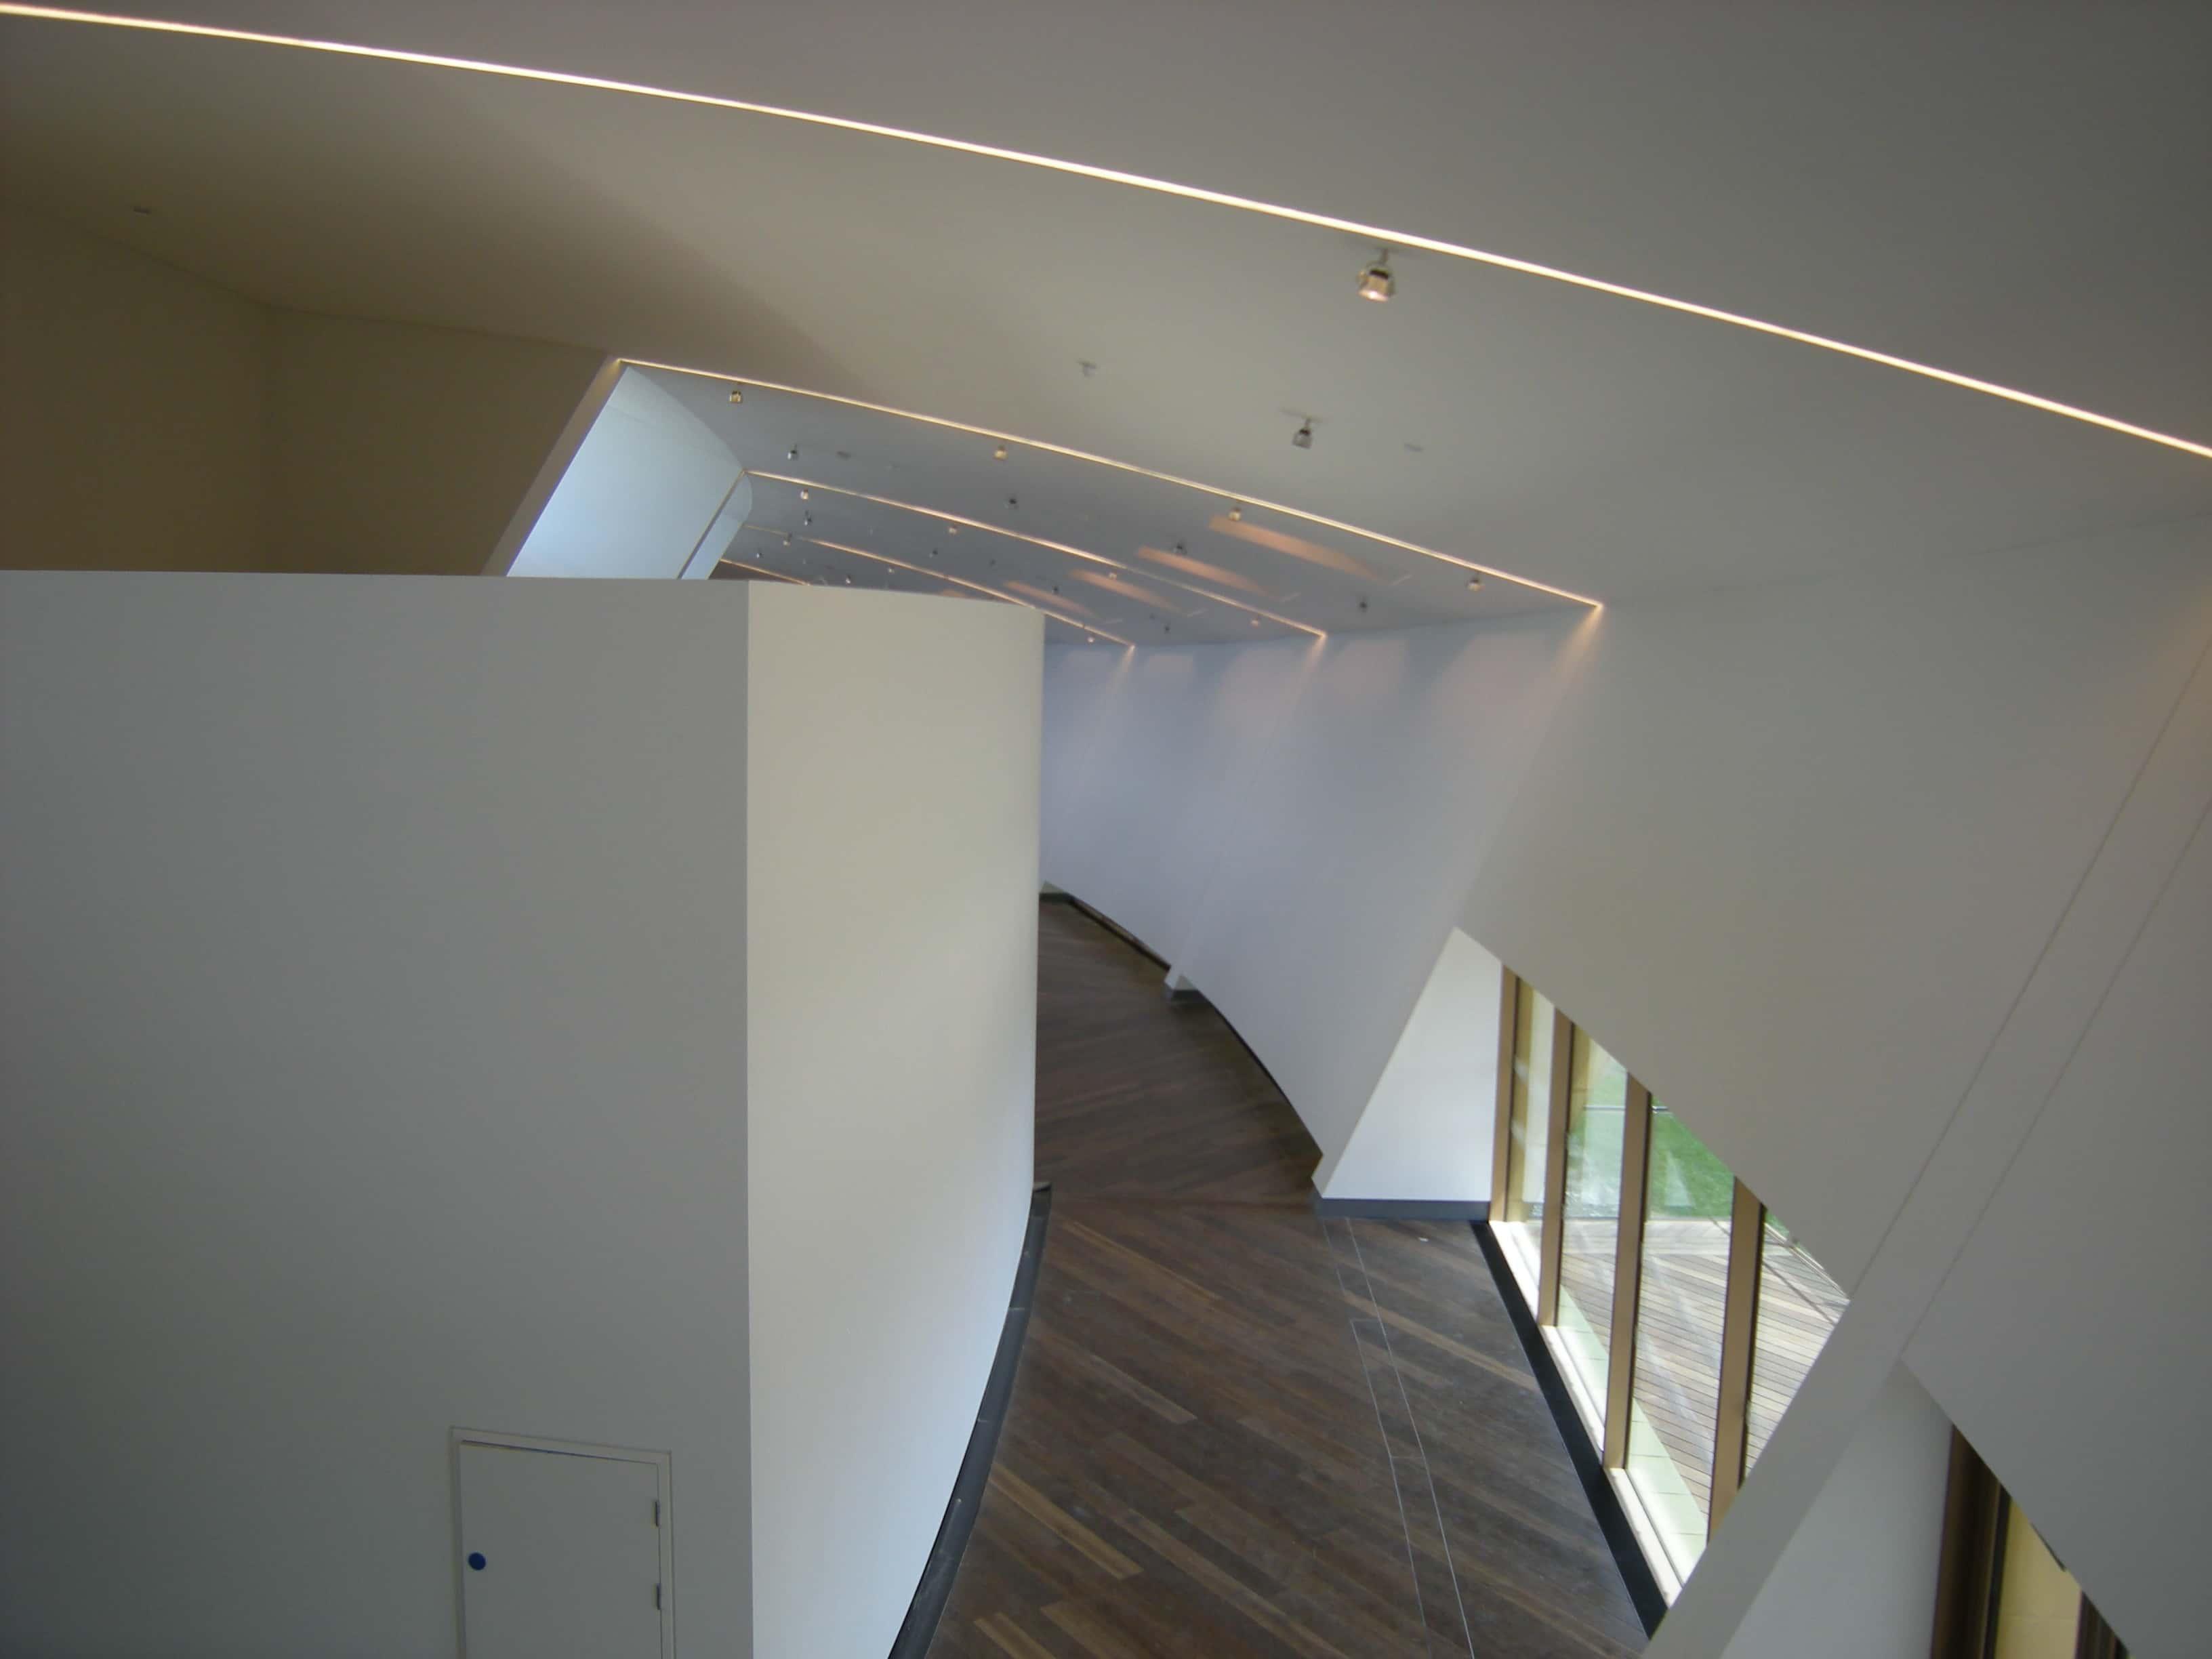 White SonaKrete on the ceiling